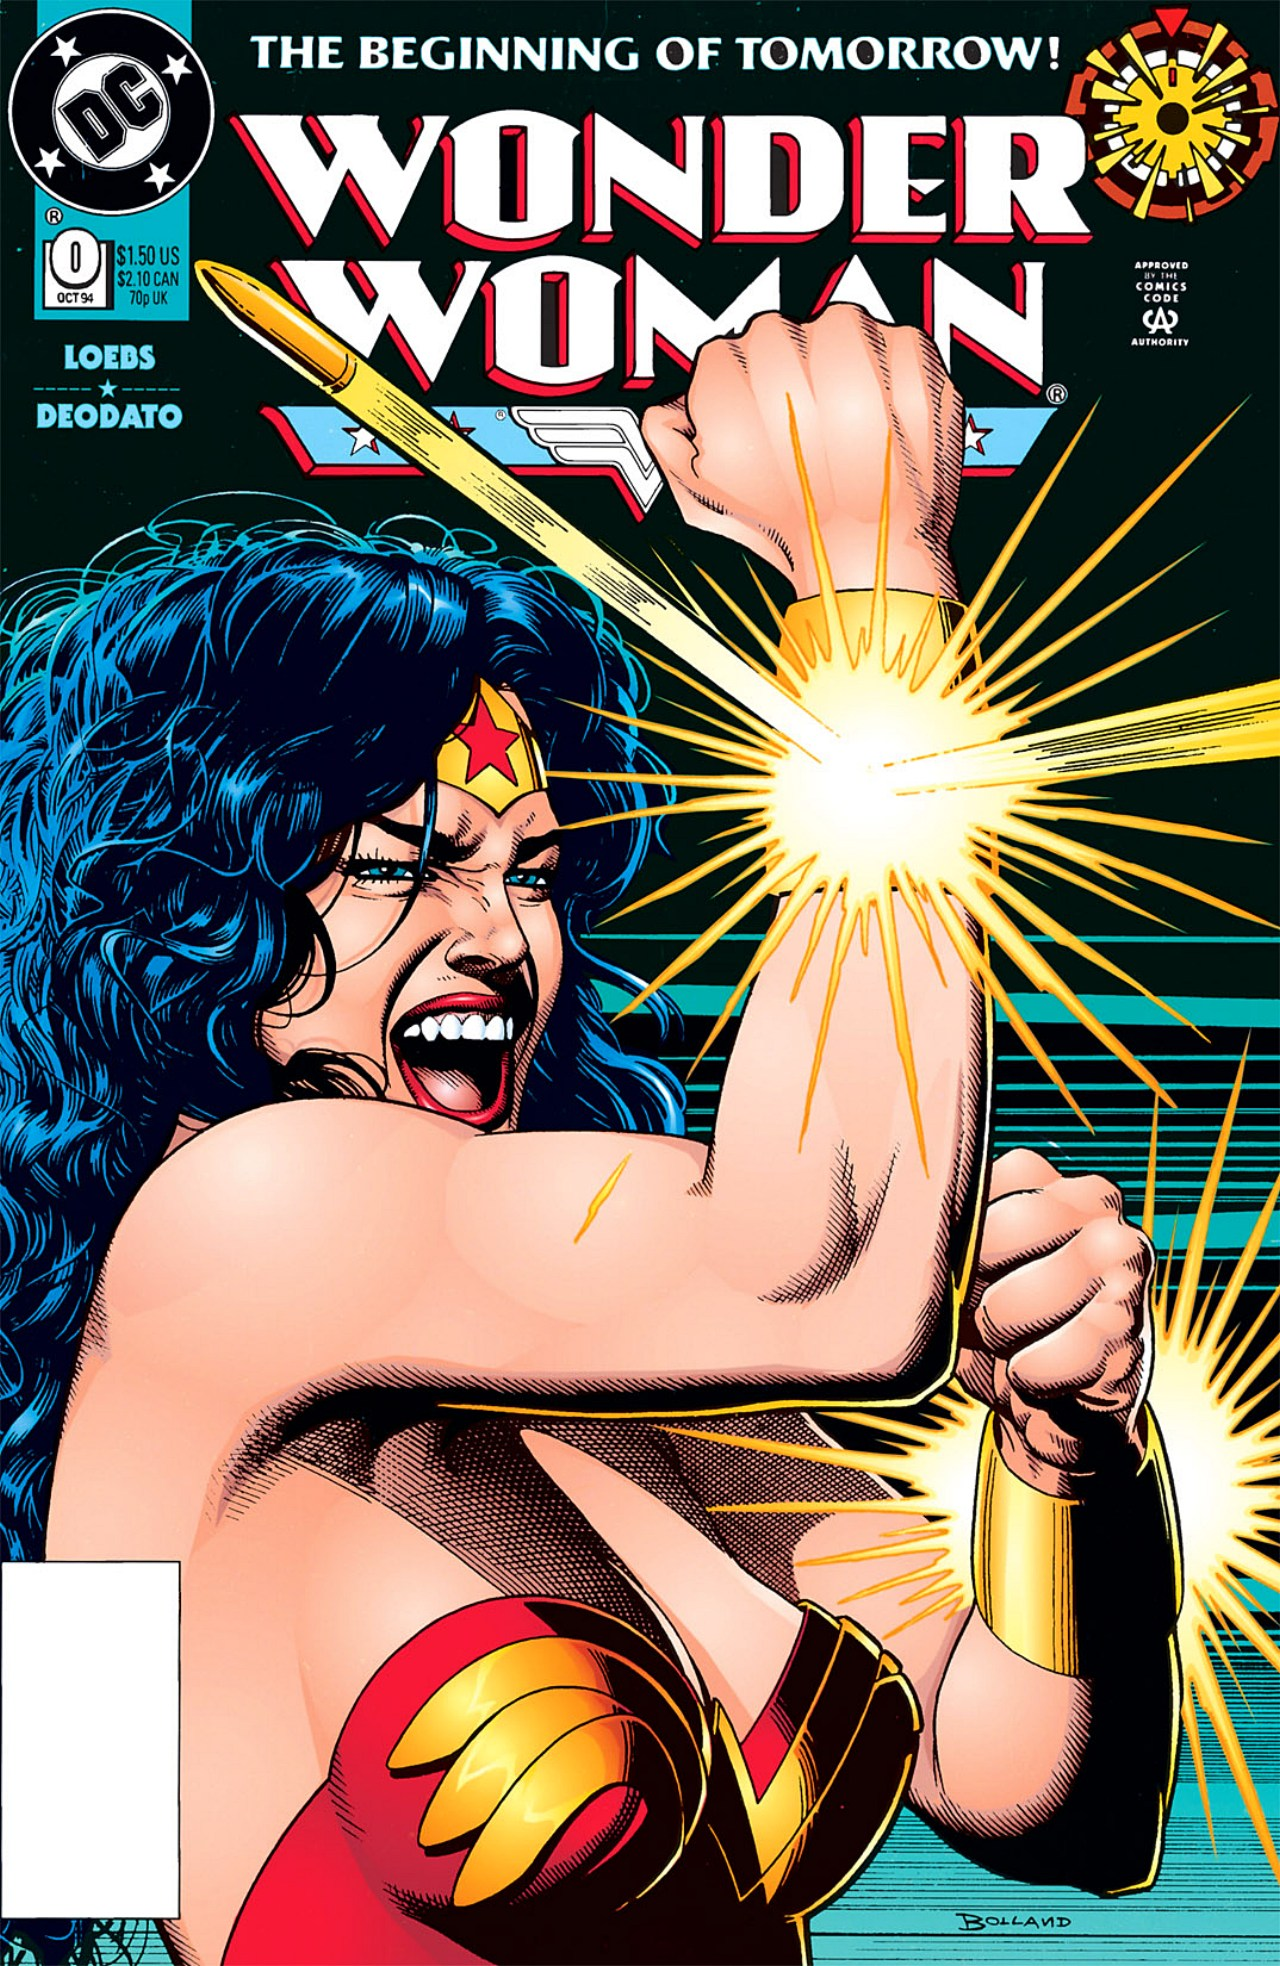 Read online Wonder Woman (1987) comic -  Issue #0 - 1